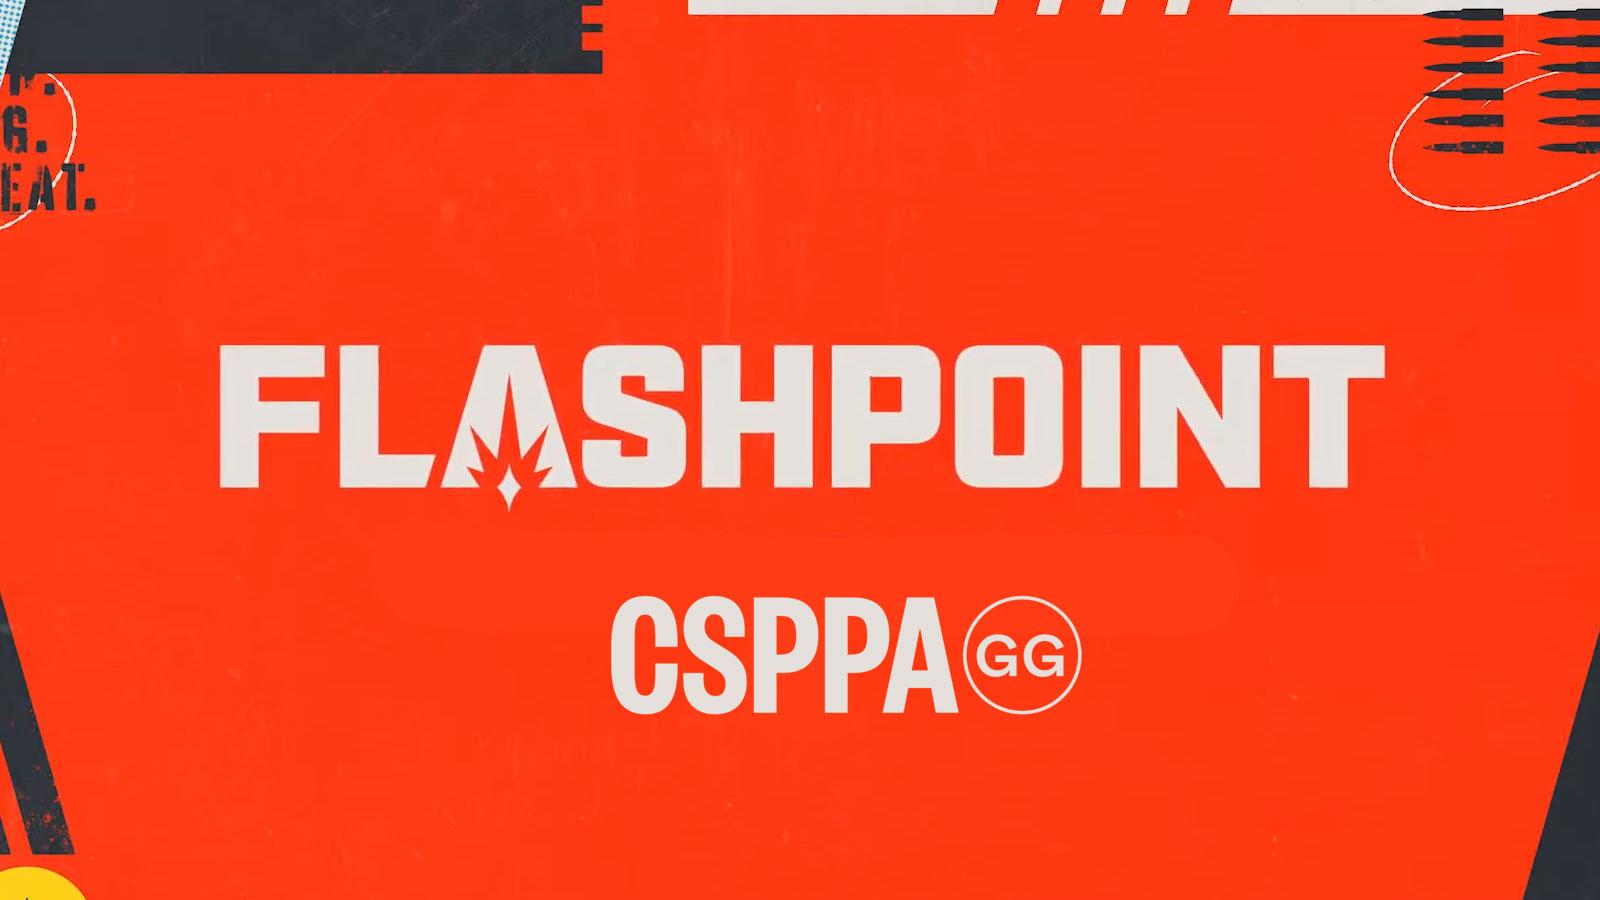 csgo flashpoint csppa